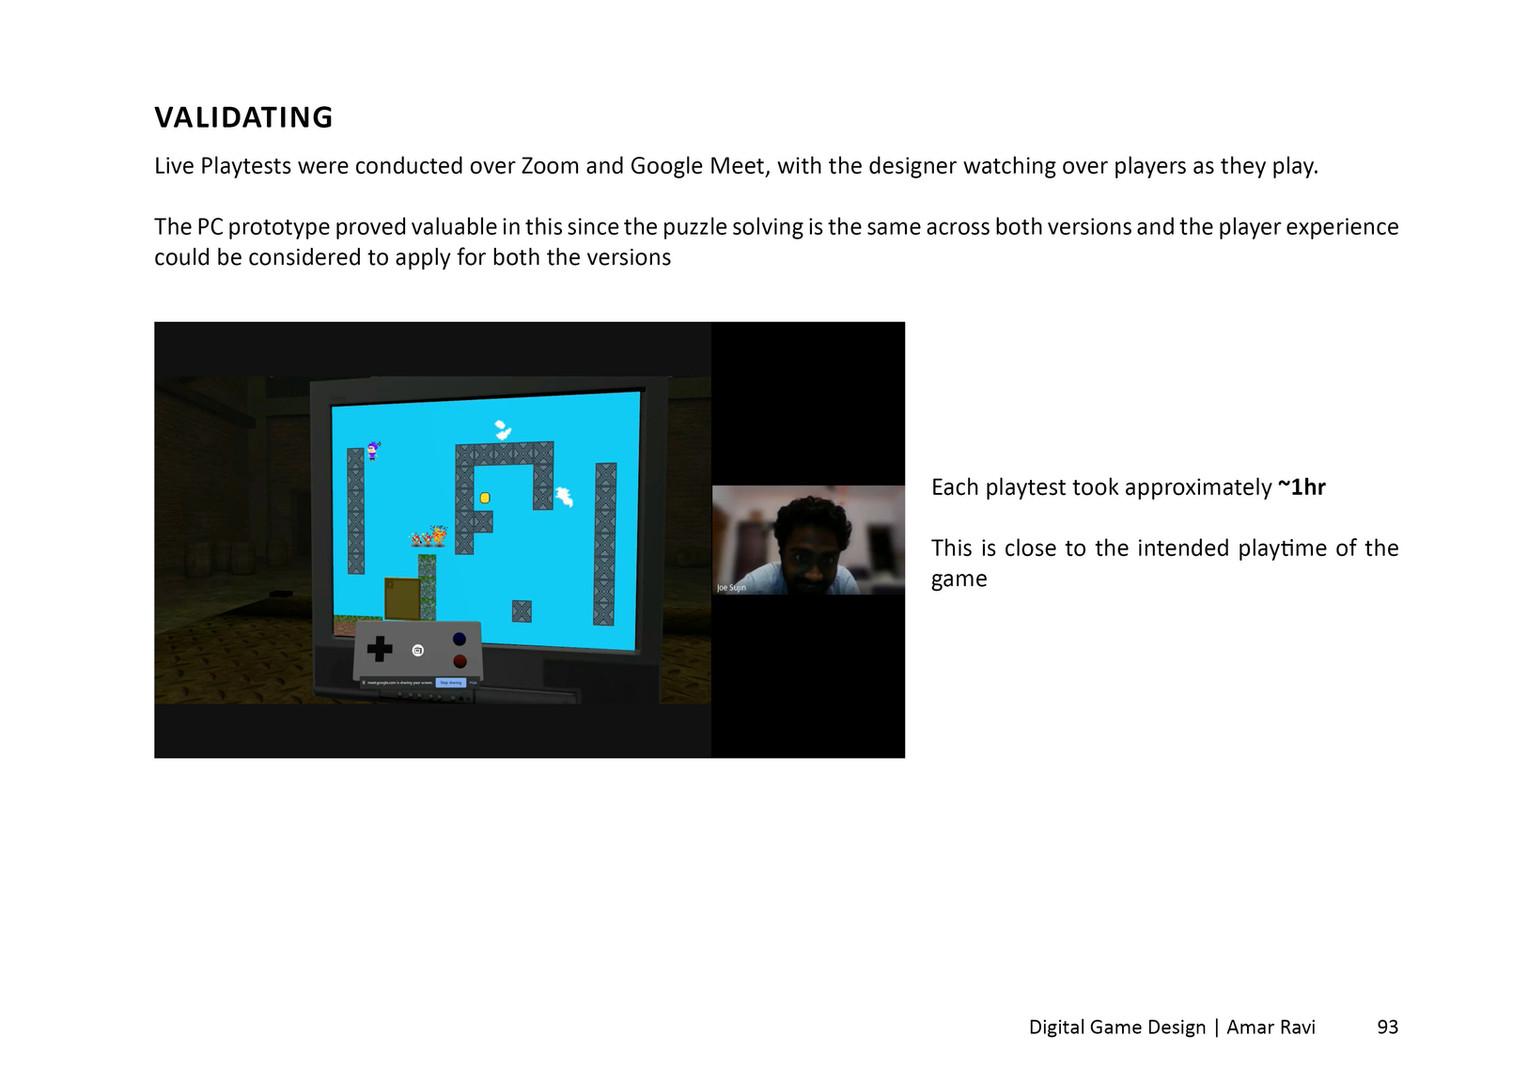 Remote Playtesting through Zoom